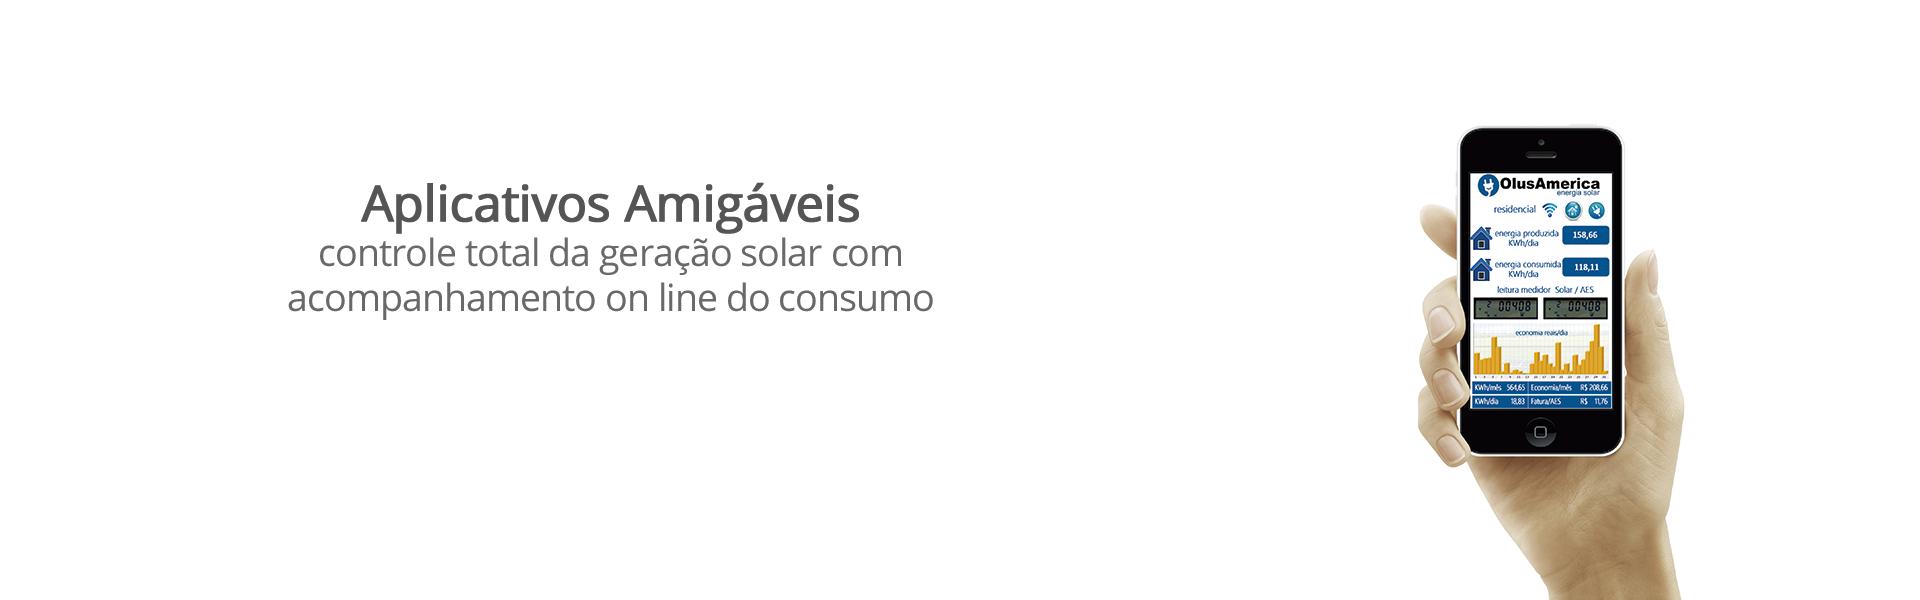 aplicativo-OlusAmerica